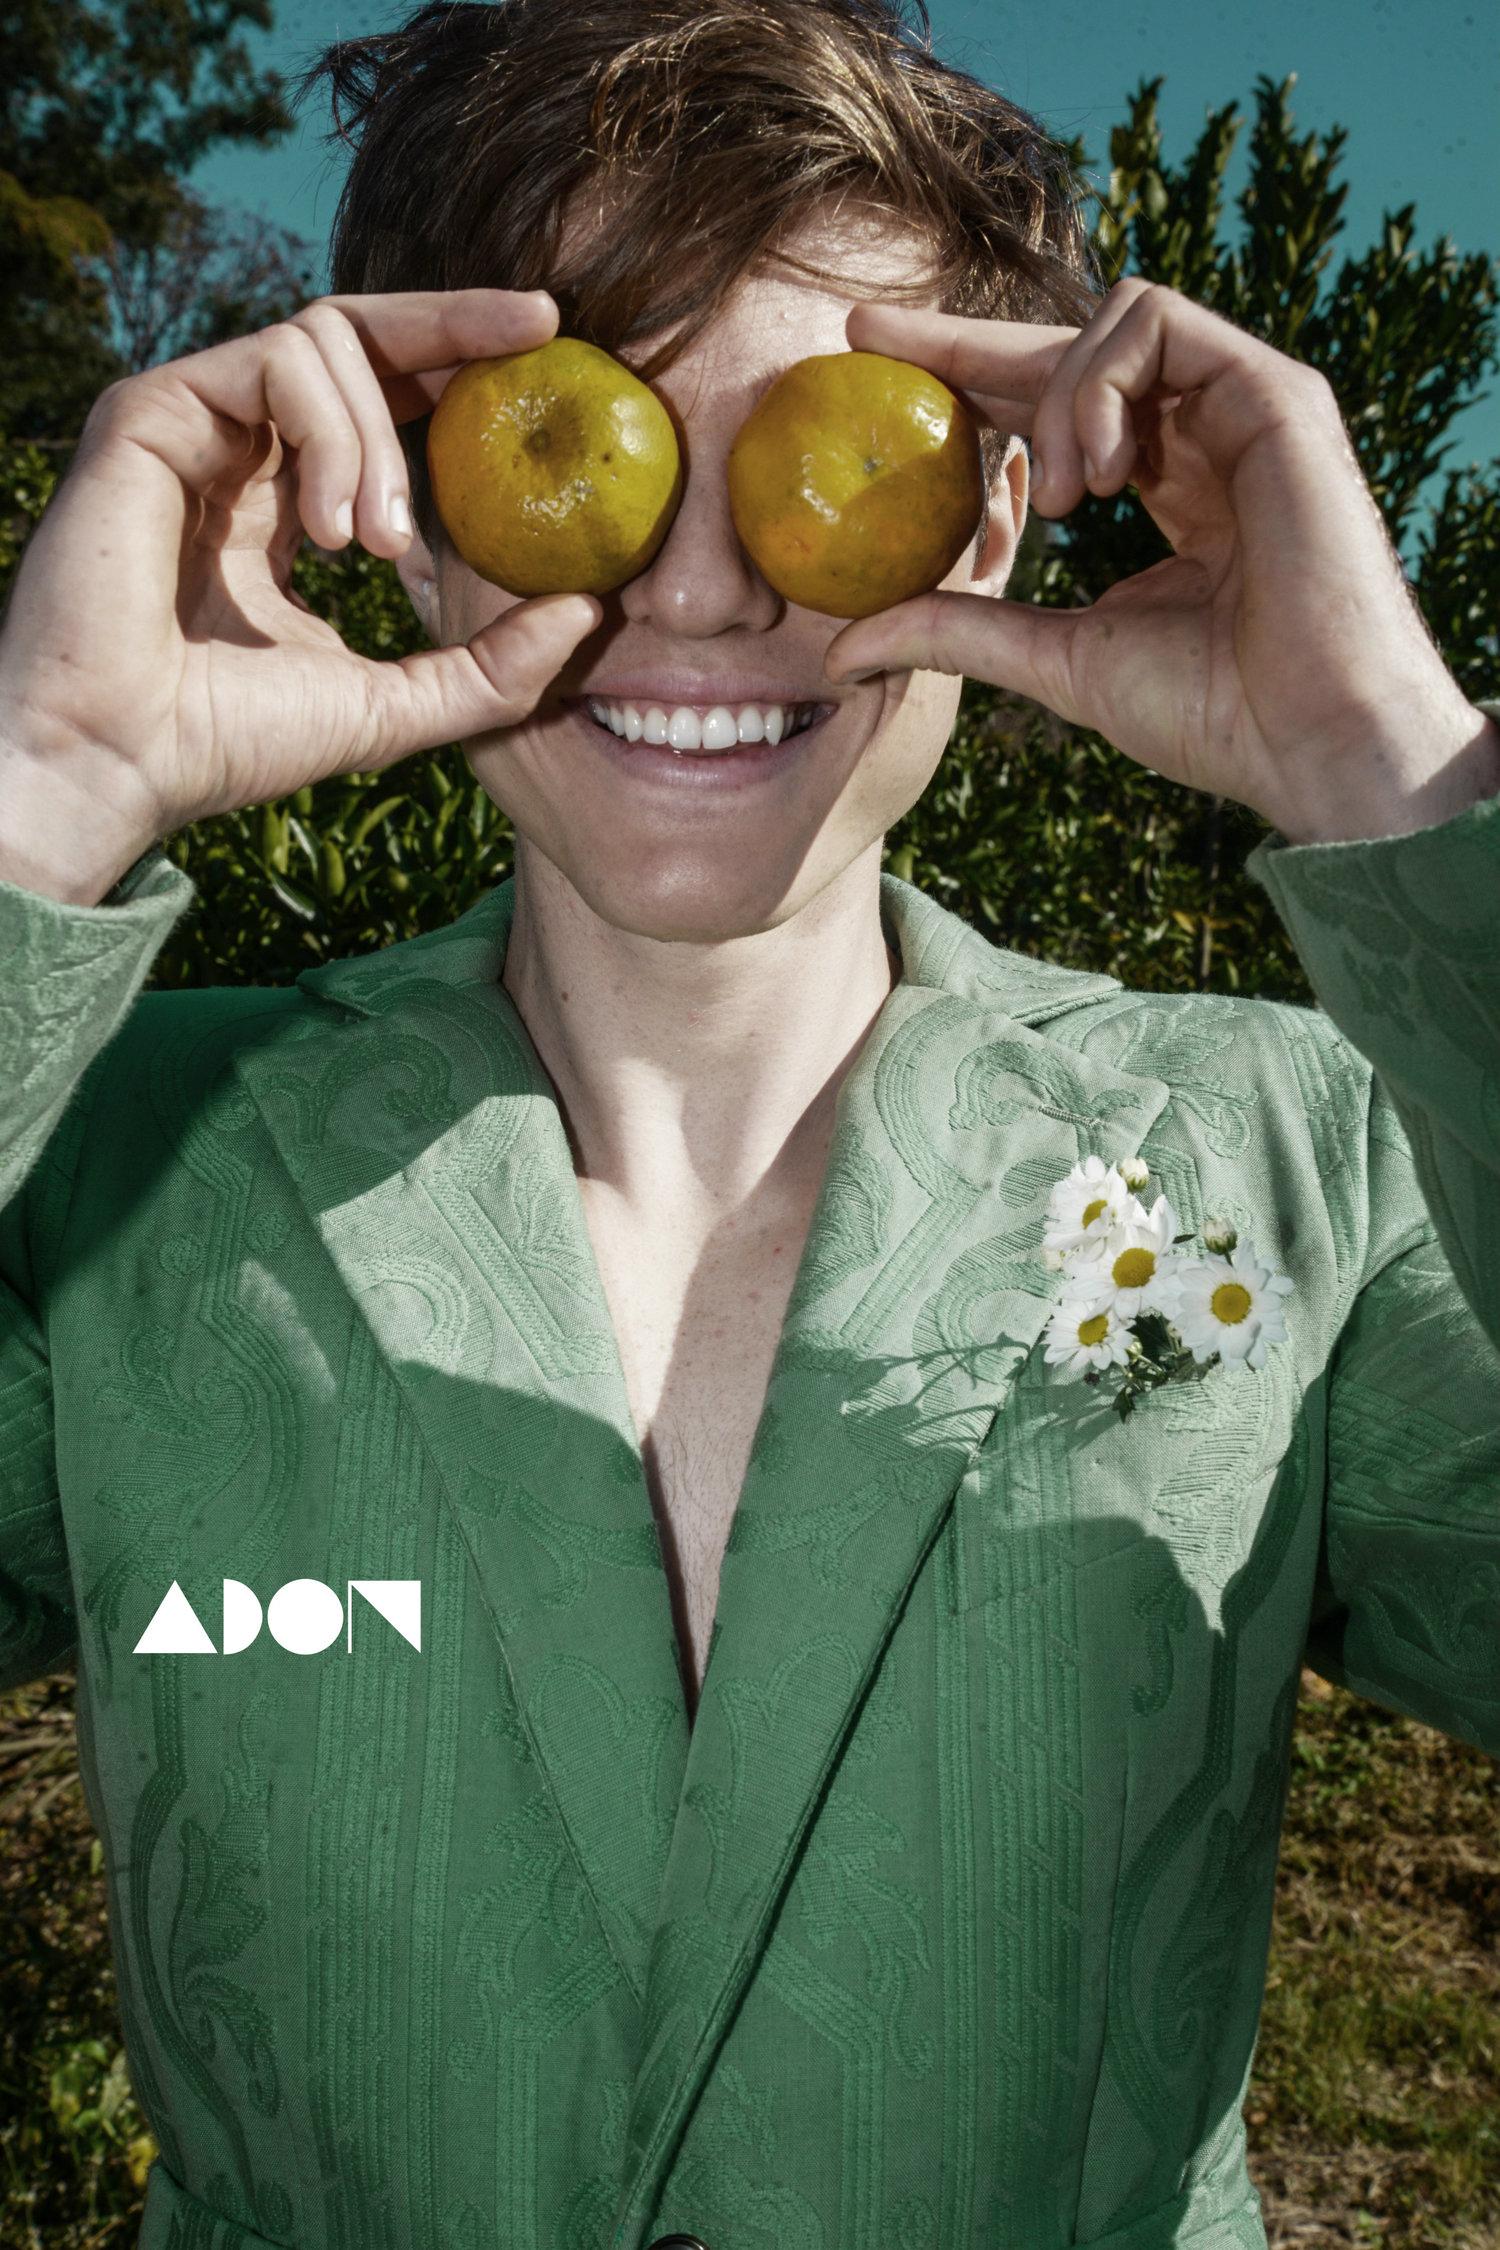 Adon Exclusive: Model Eduardo Schuelter By Rodrigo Marconatto